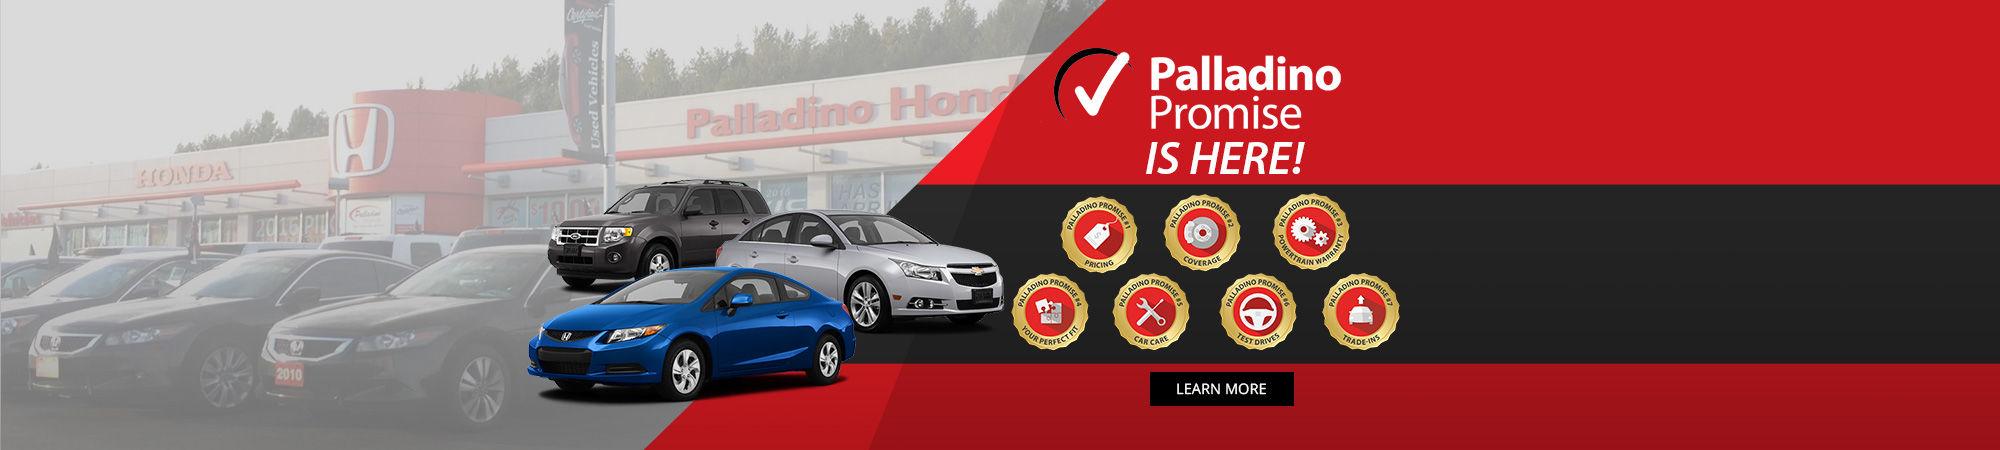 The Palladino Promise !